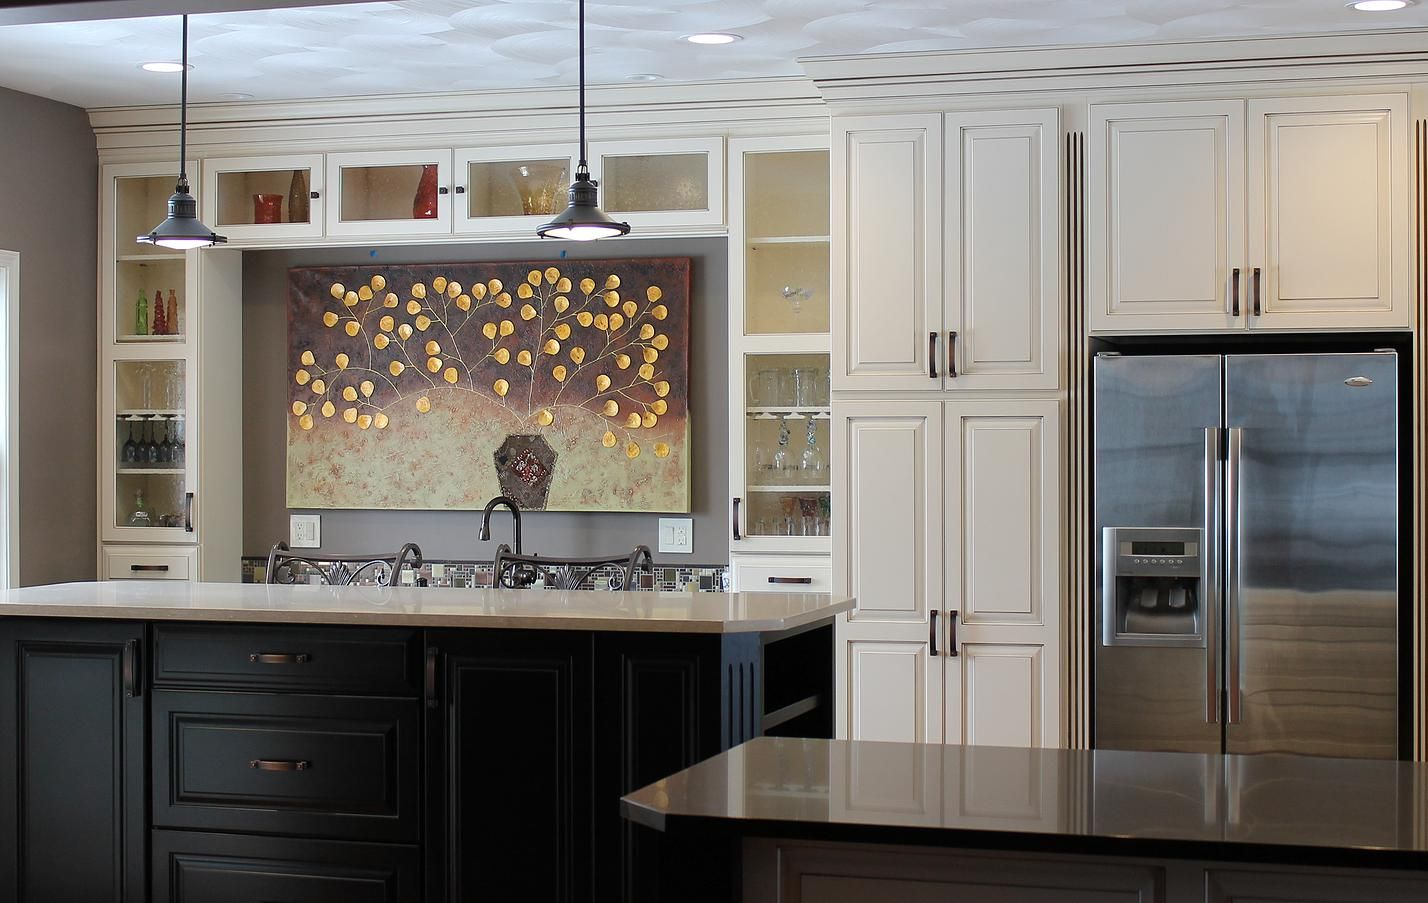 Bailey Hardwoods Woodworking Springfield Il Kitchen Cabinetry Kitchen Cabinets Kitchen Design